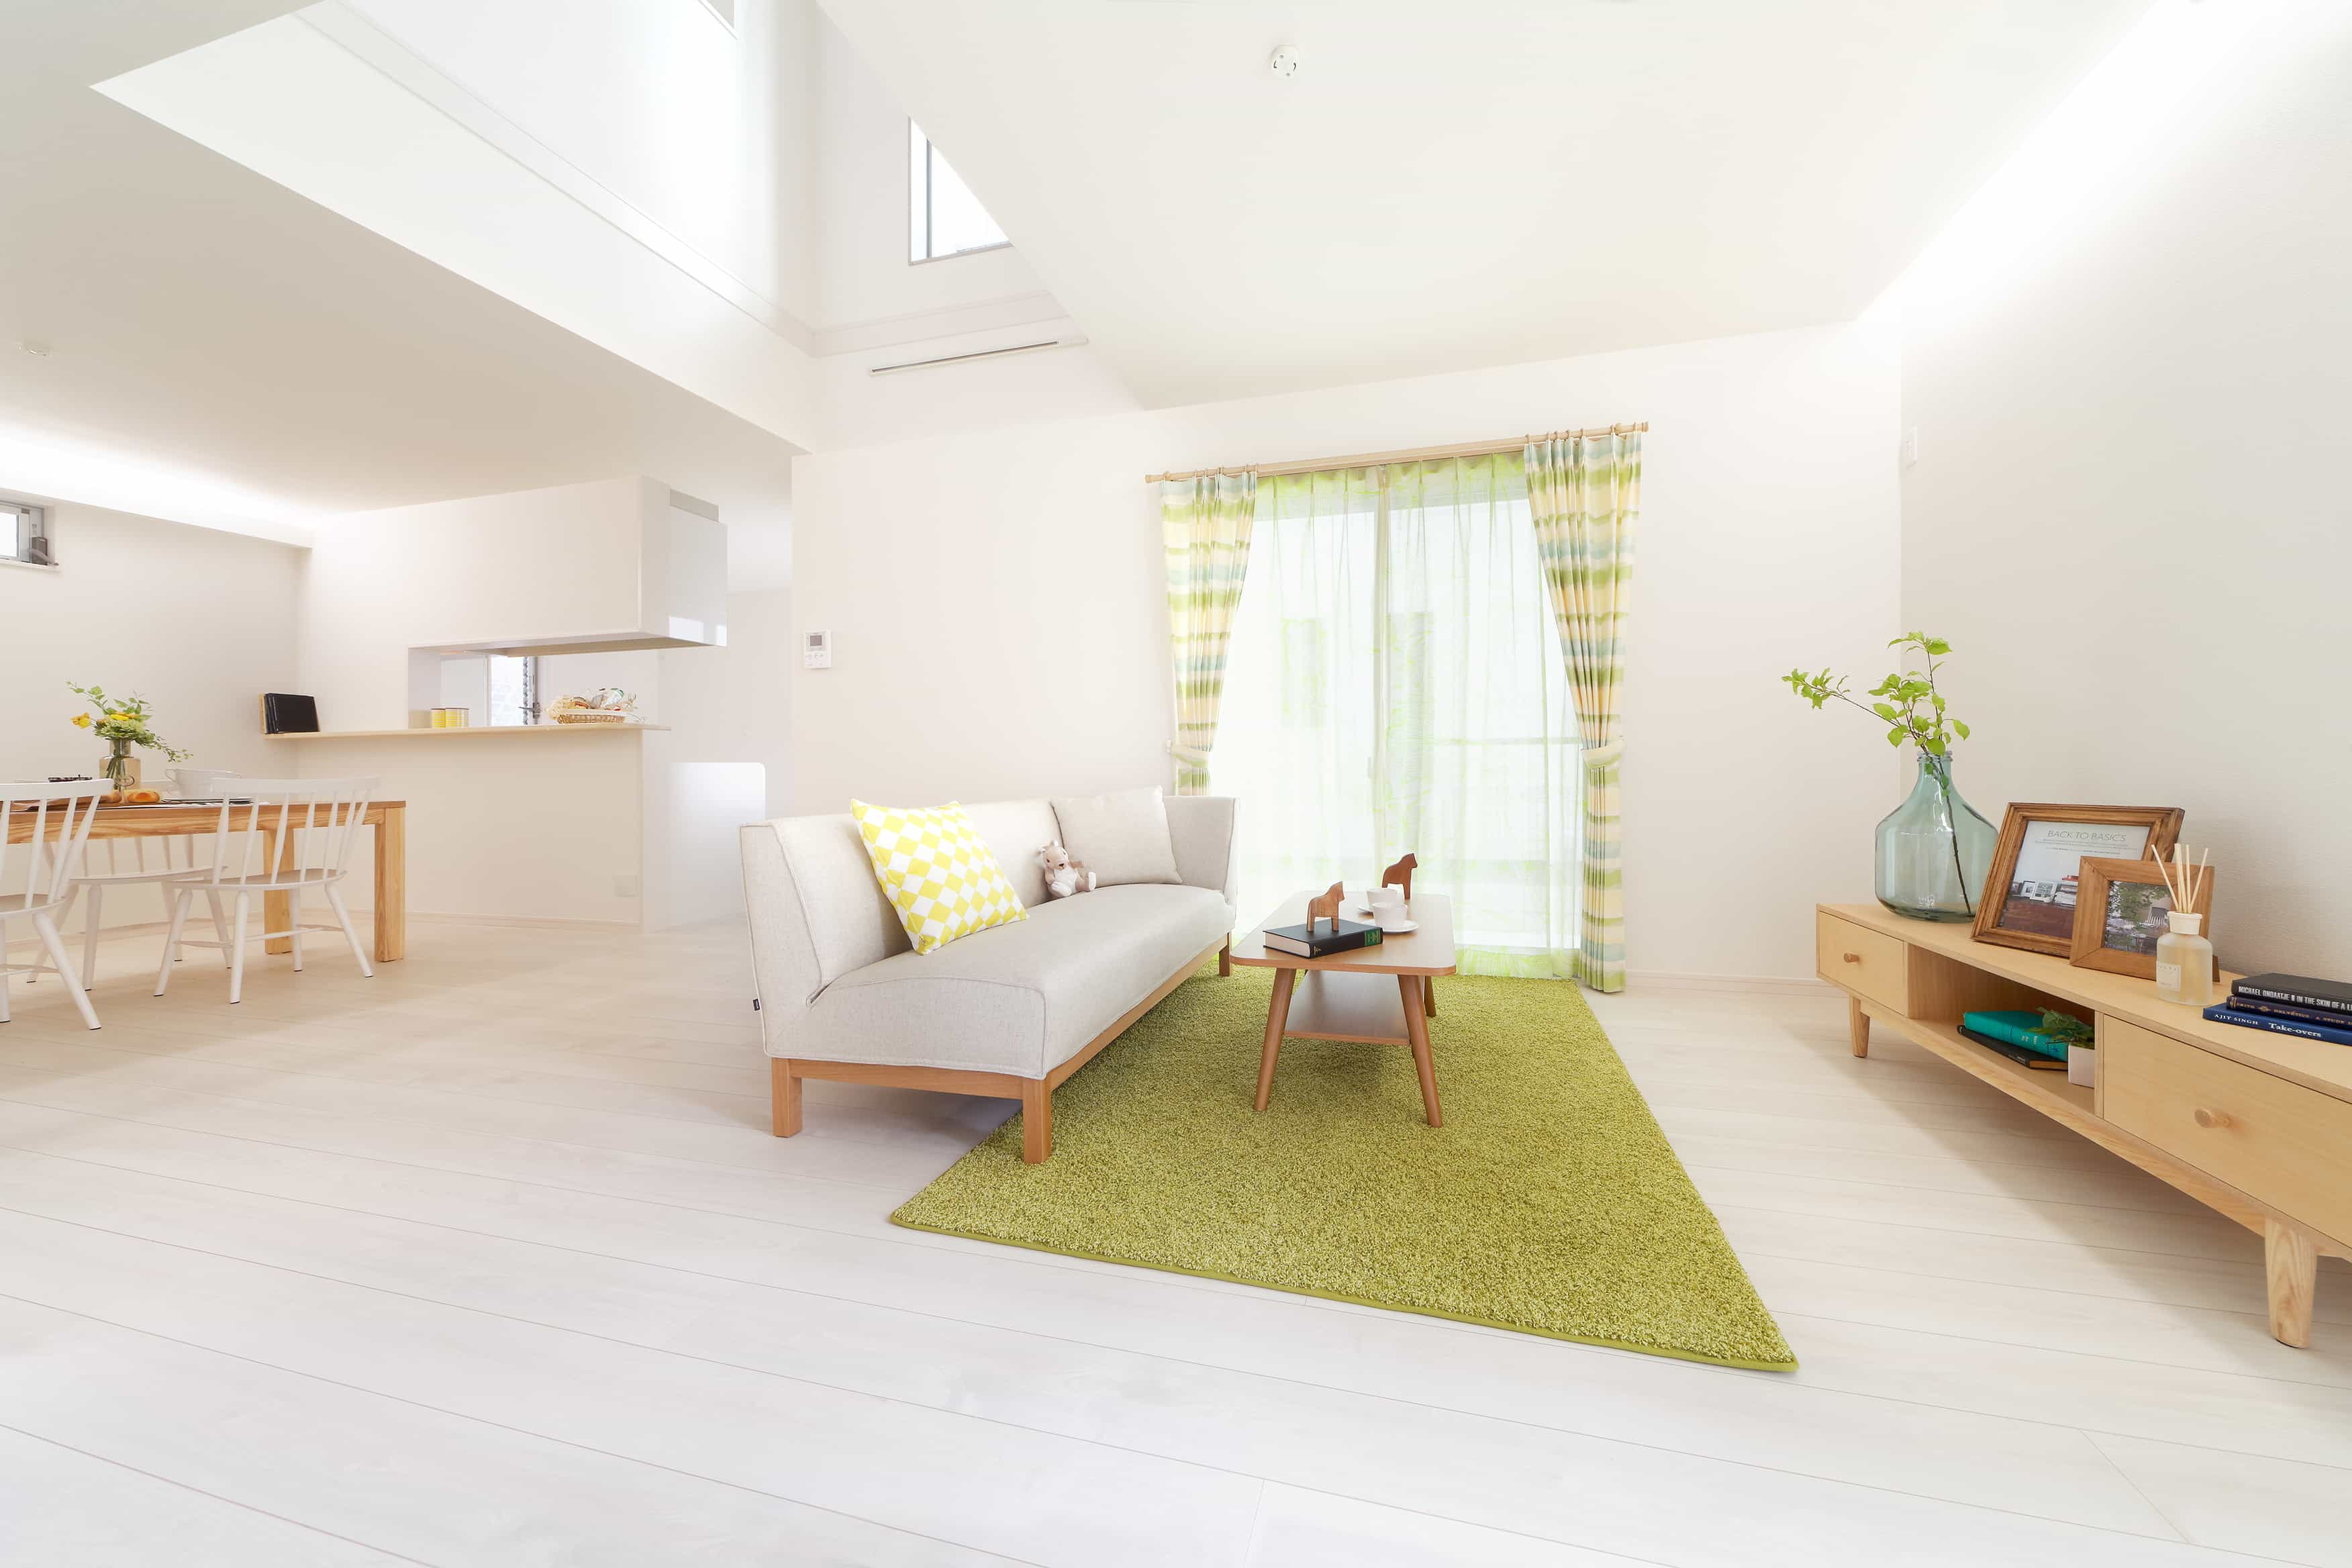 smart& | ブランド | 堺市 注文住宅 HOUSECODE